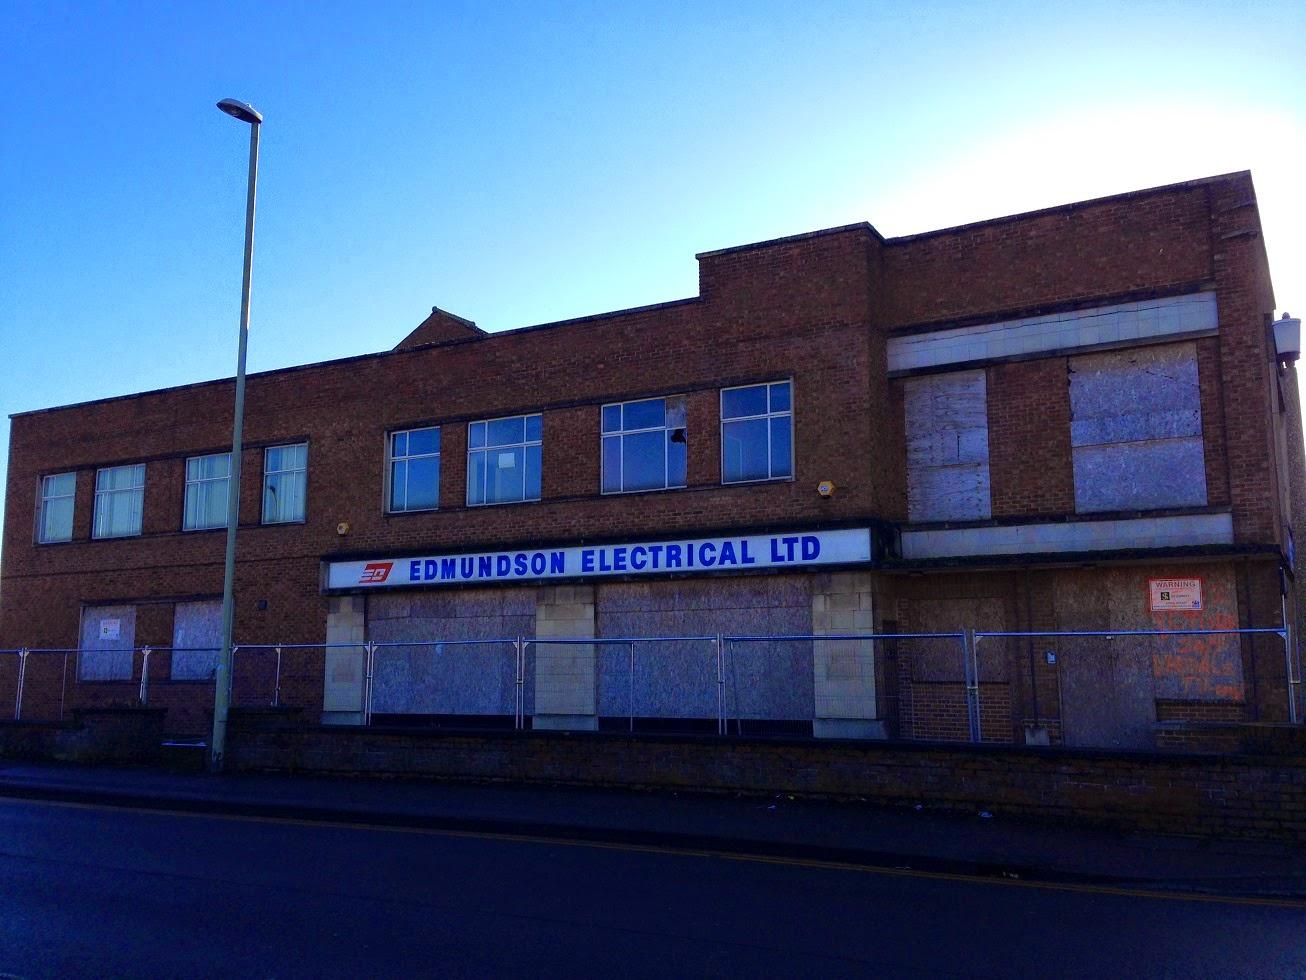 Abandoned building, Gloucester